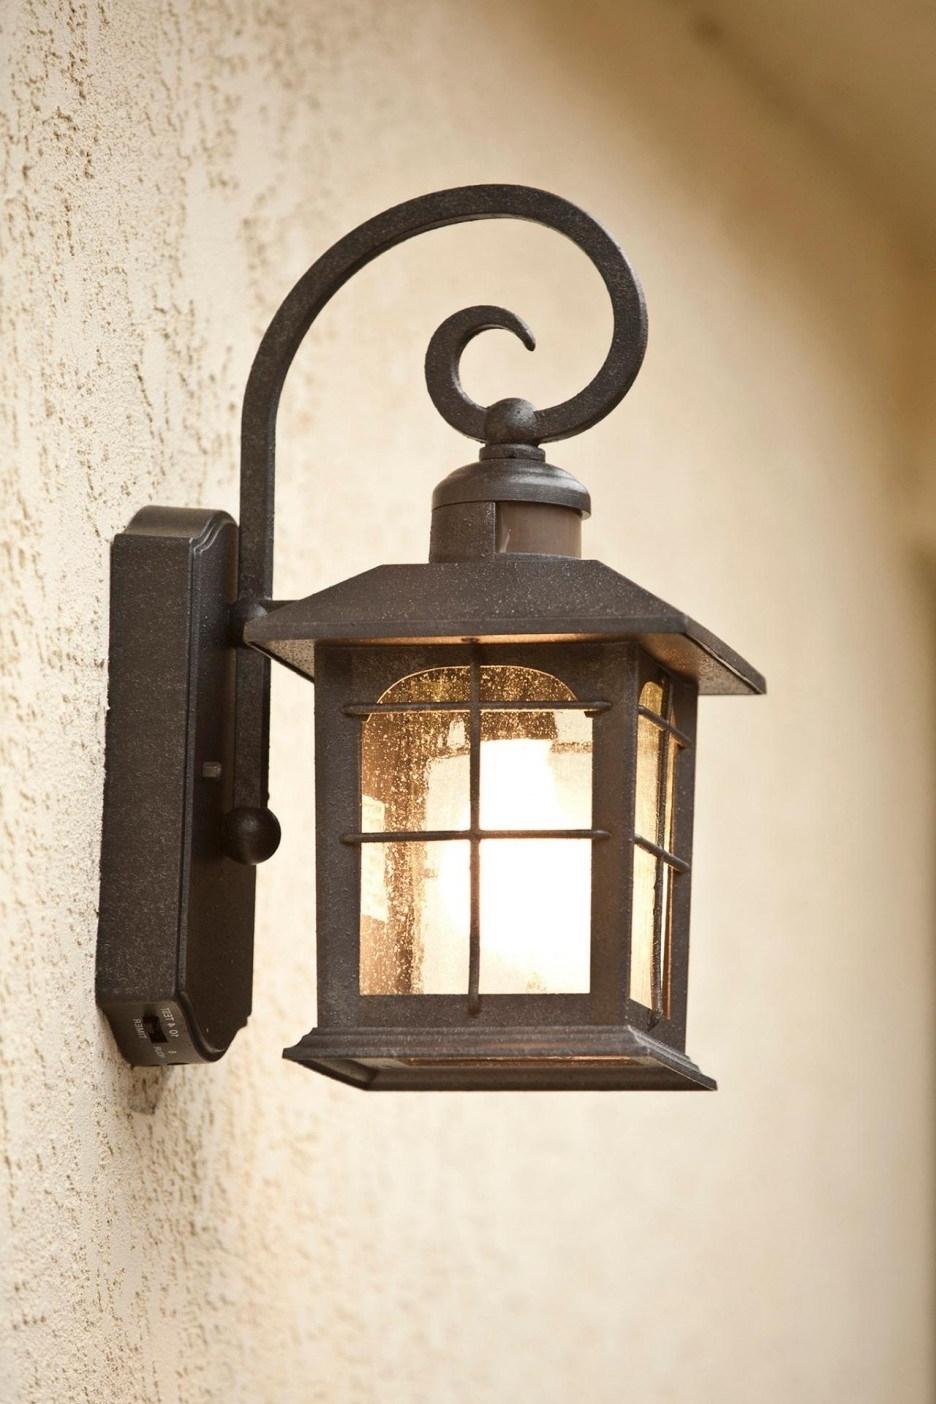 Outdoor Lighting Japanese Lanterns With Regard To Best And Newest Lantern Style Outdoor Lighting – Democraciaejustica (View 14 of 20)